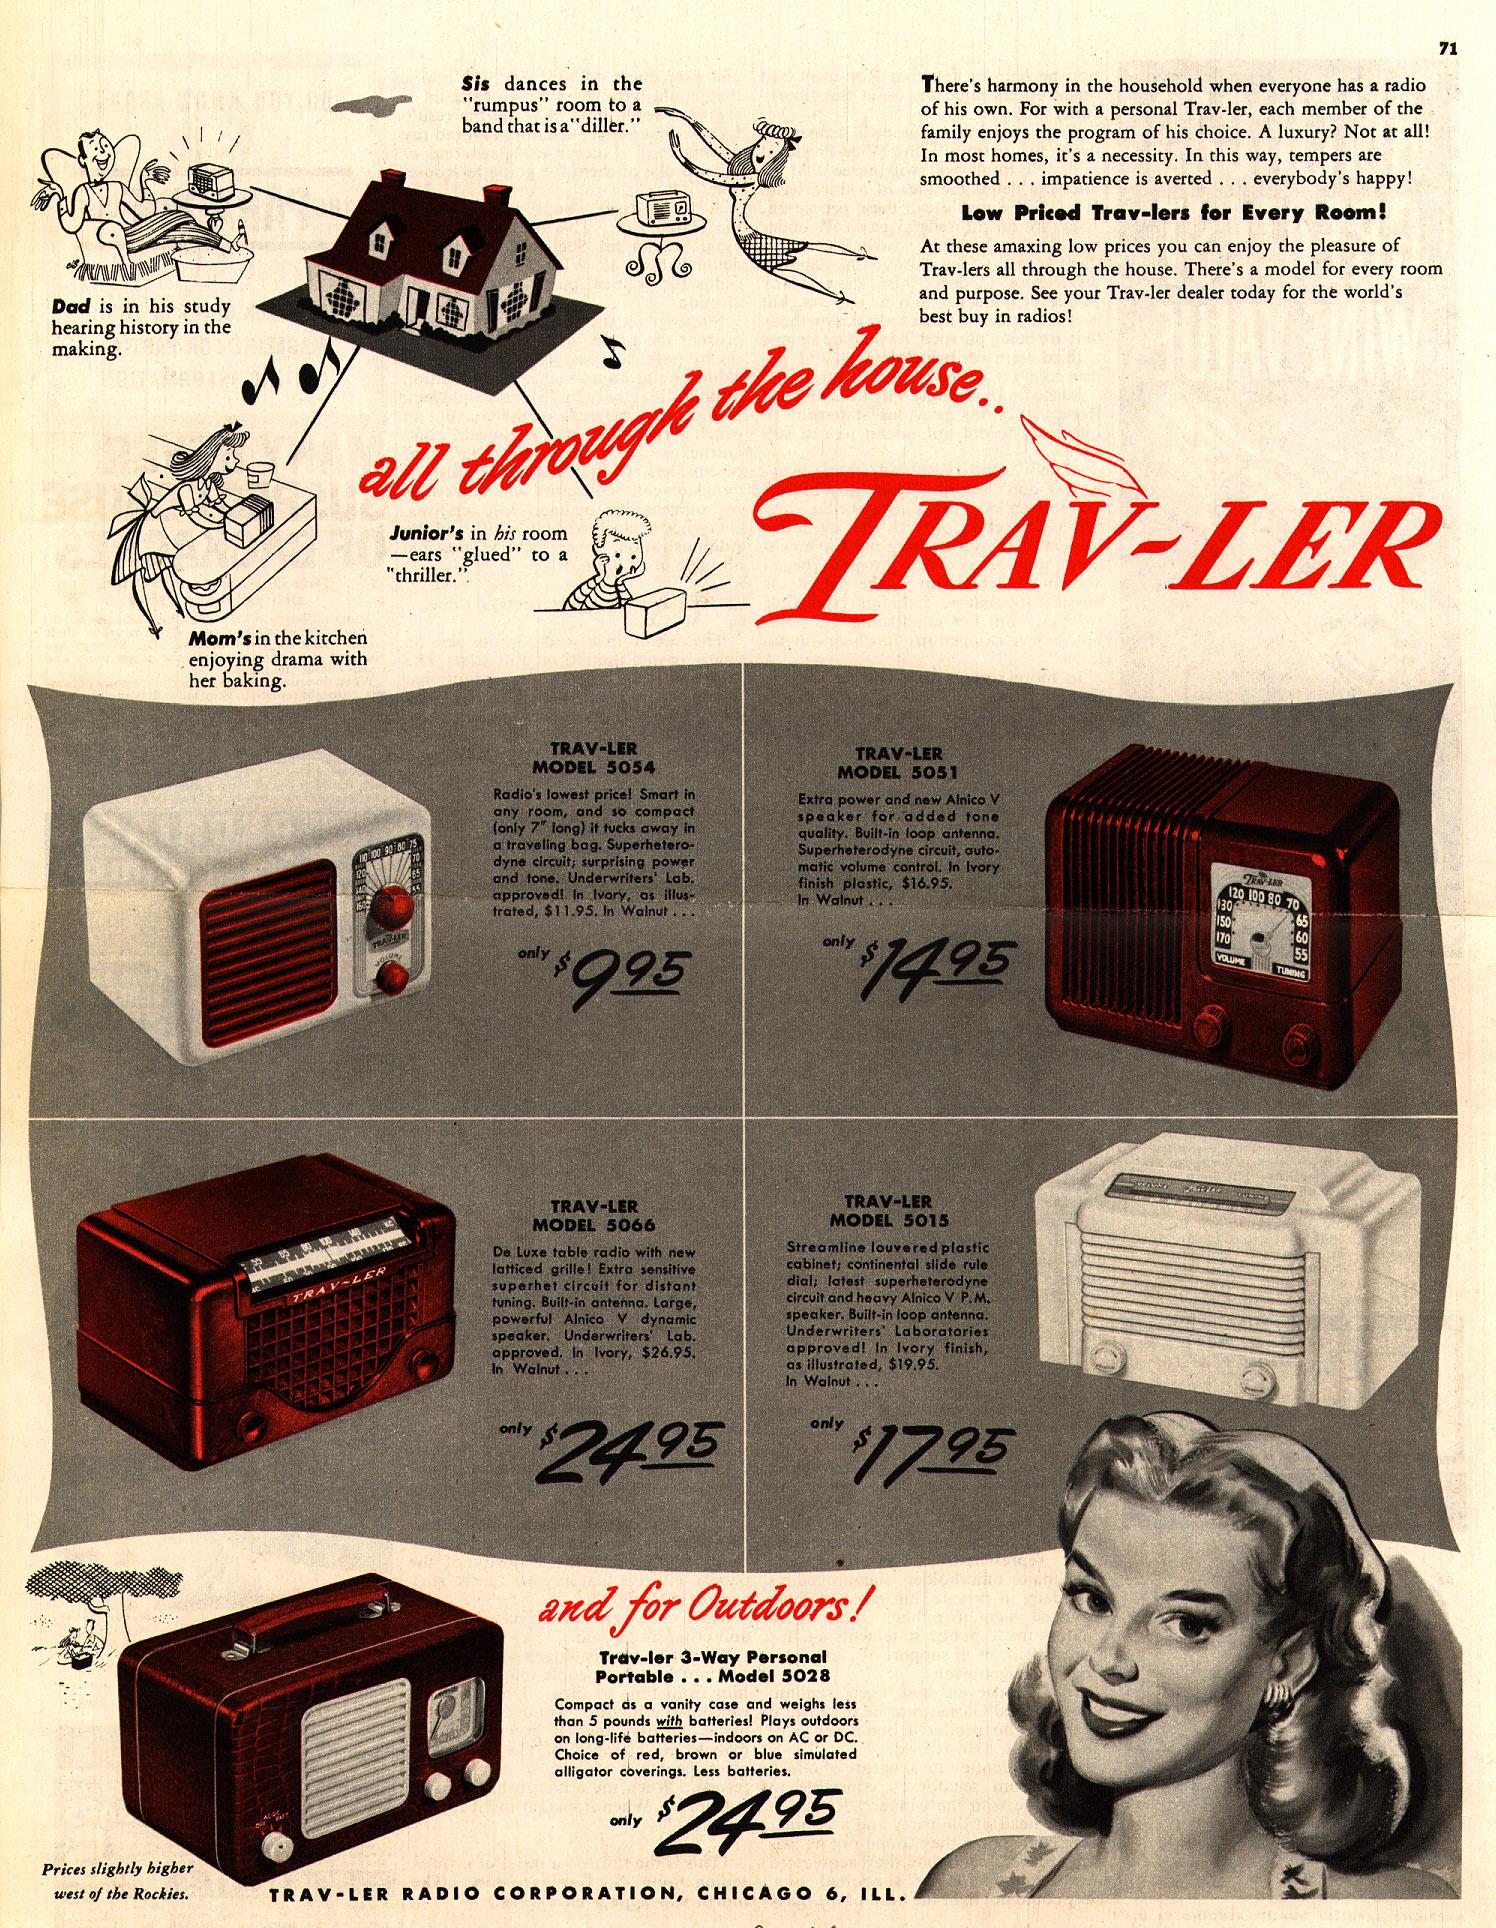 Trav-ler Radio